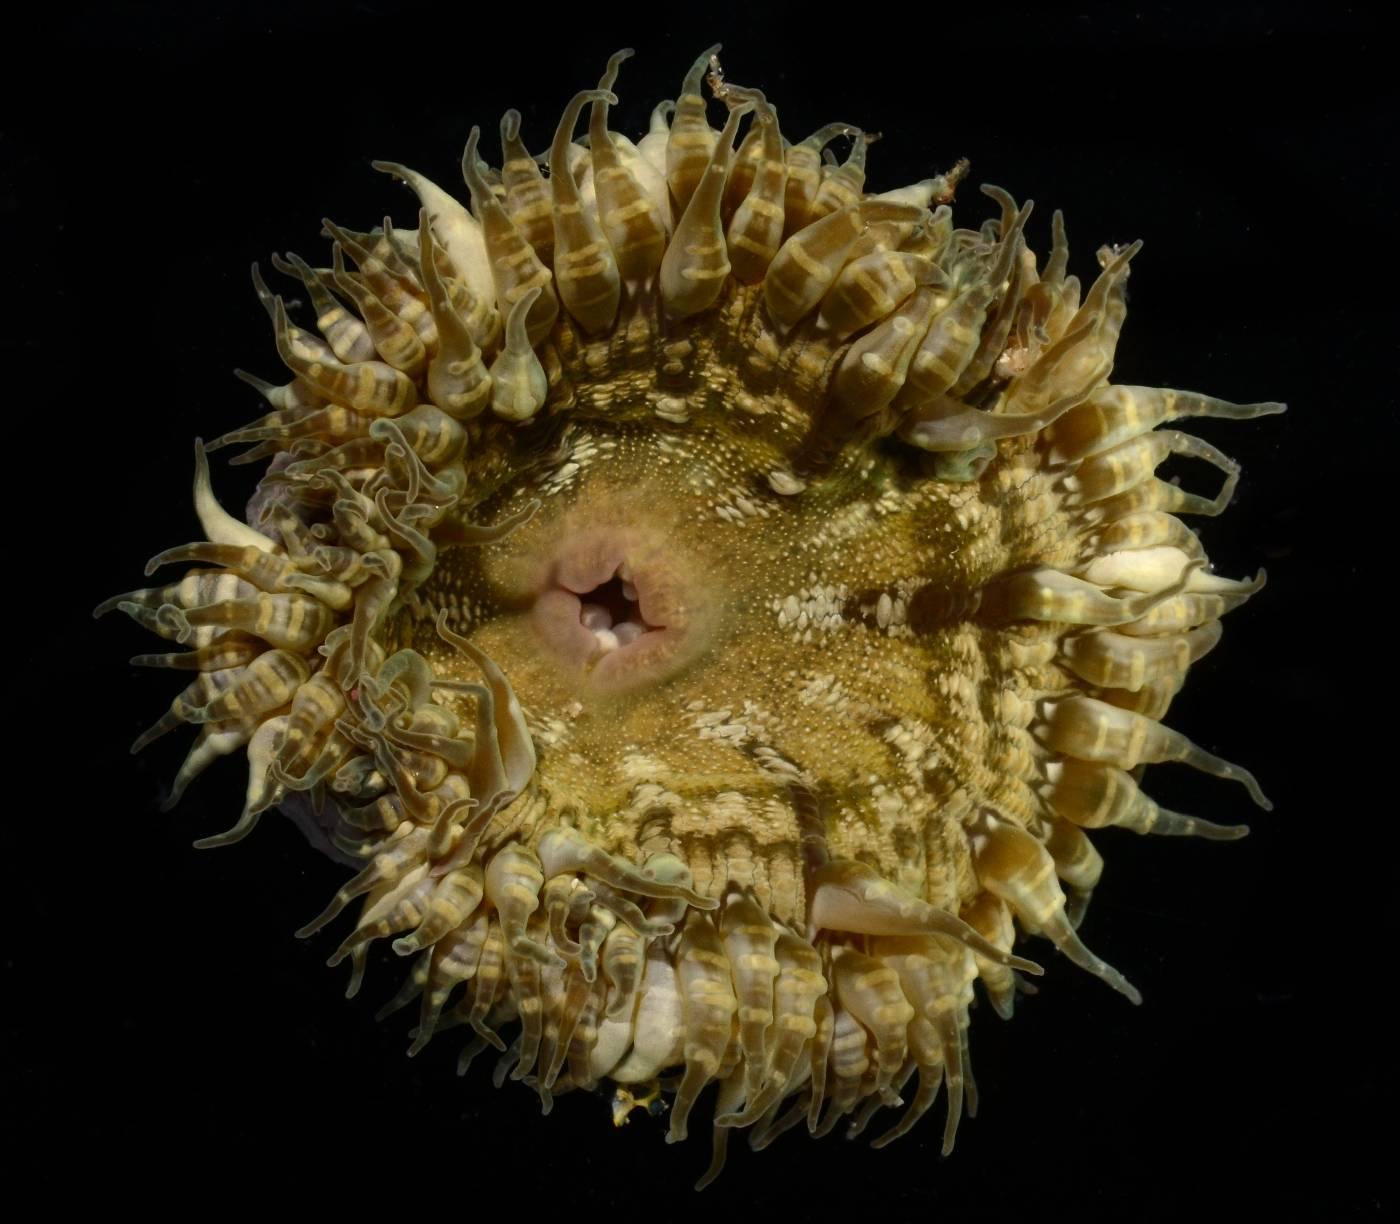 Phymanthidae image